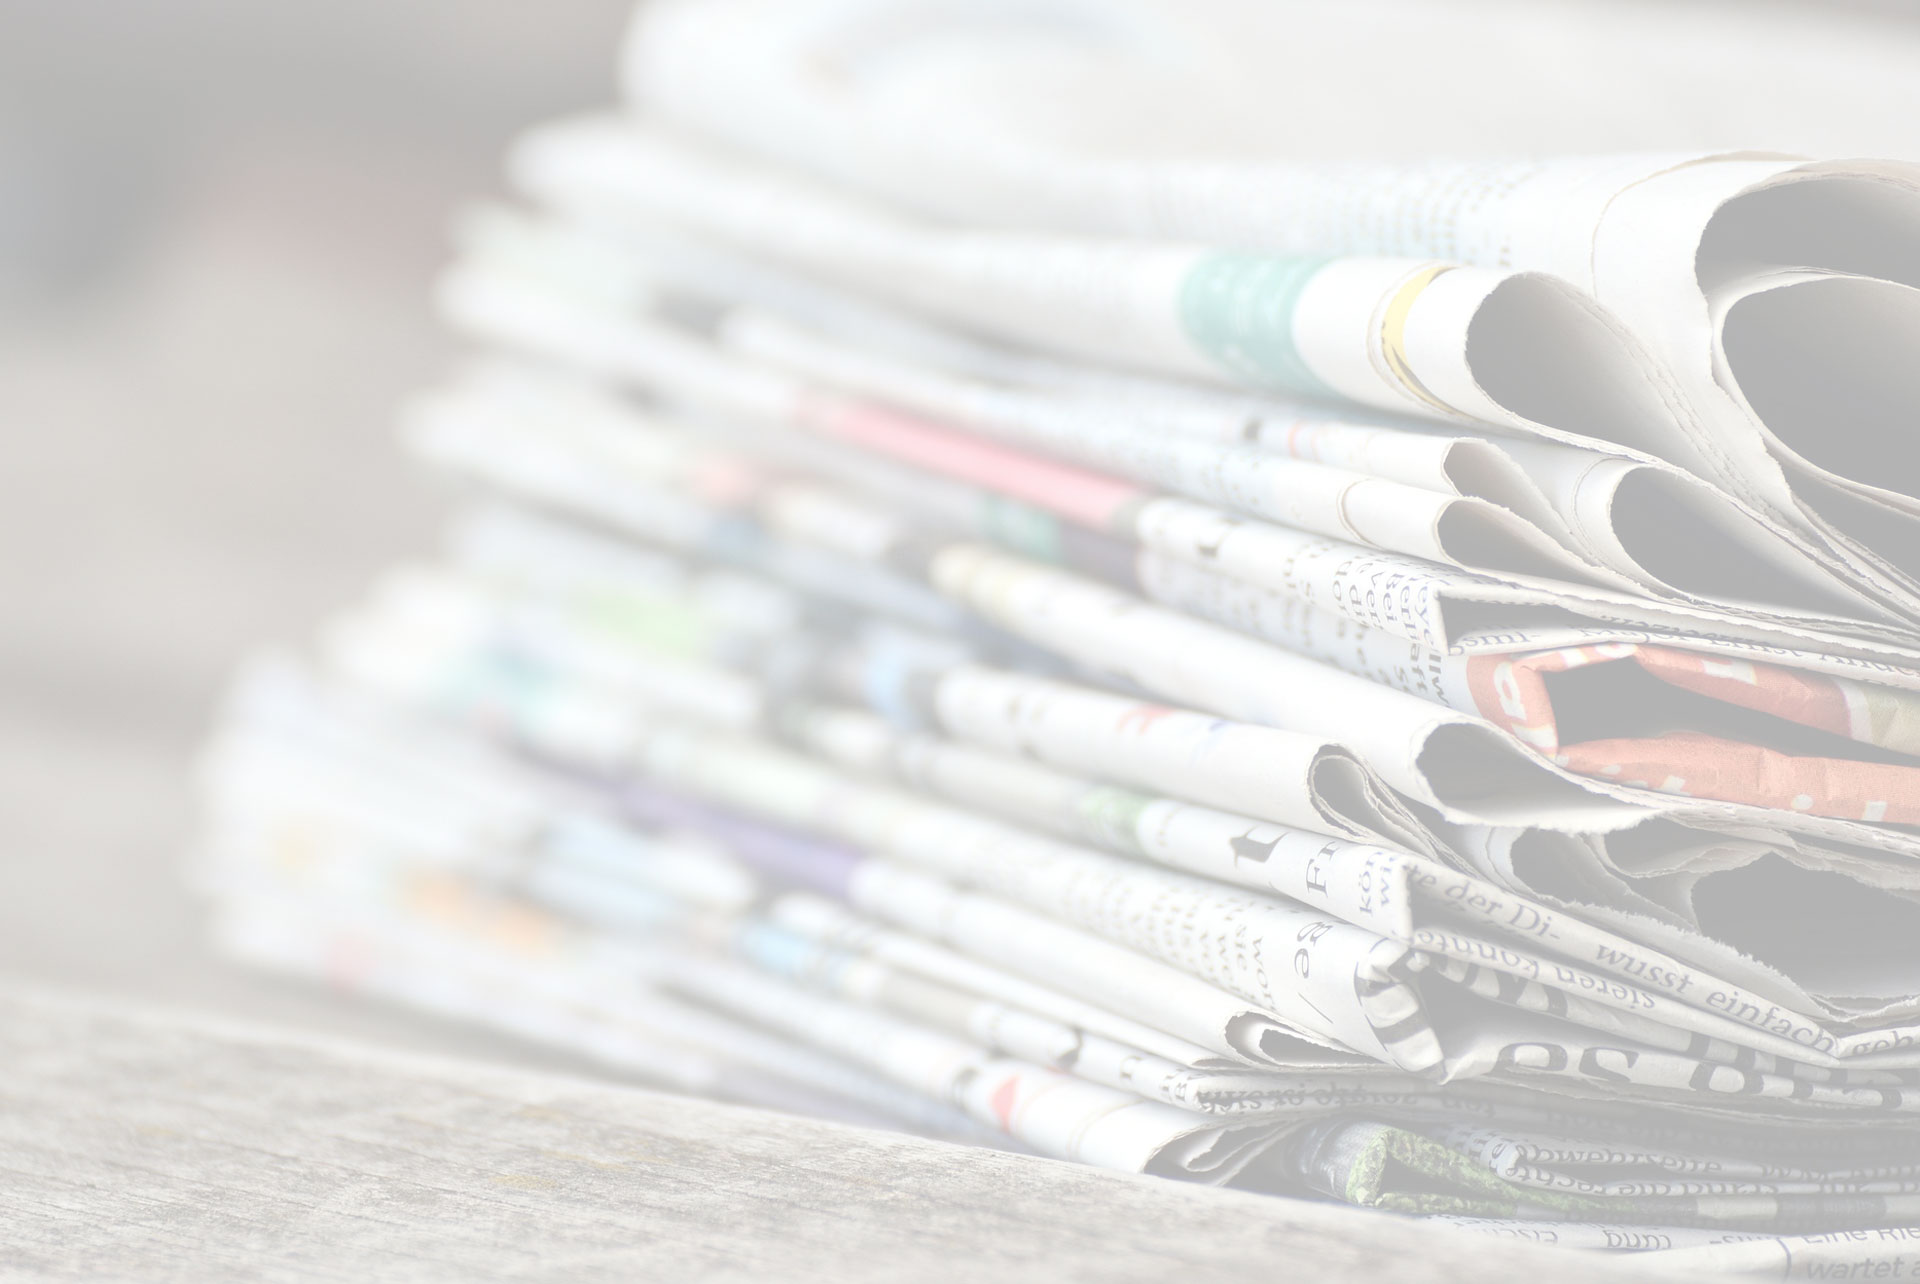 Berlusconi M5S